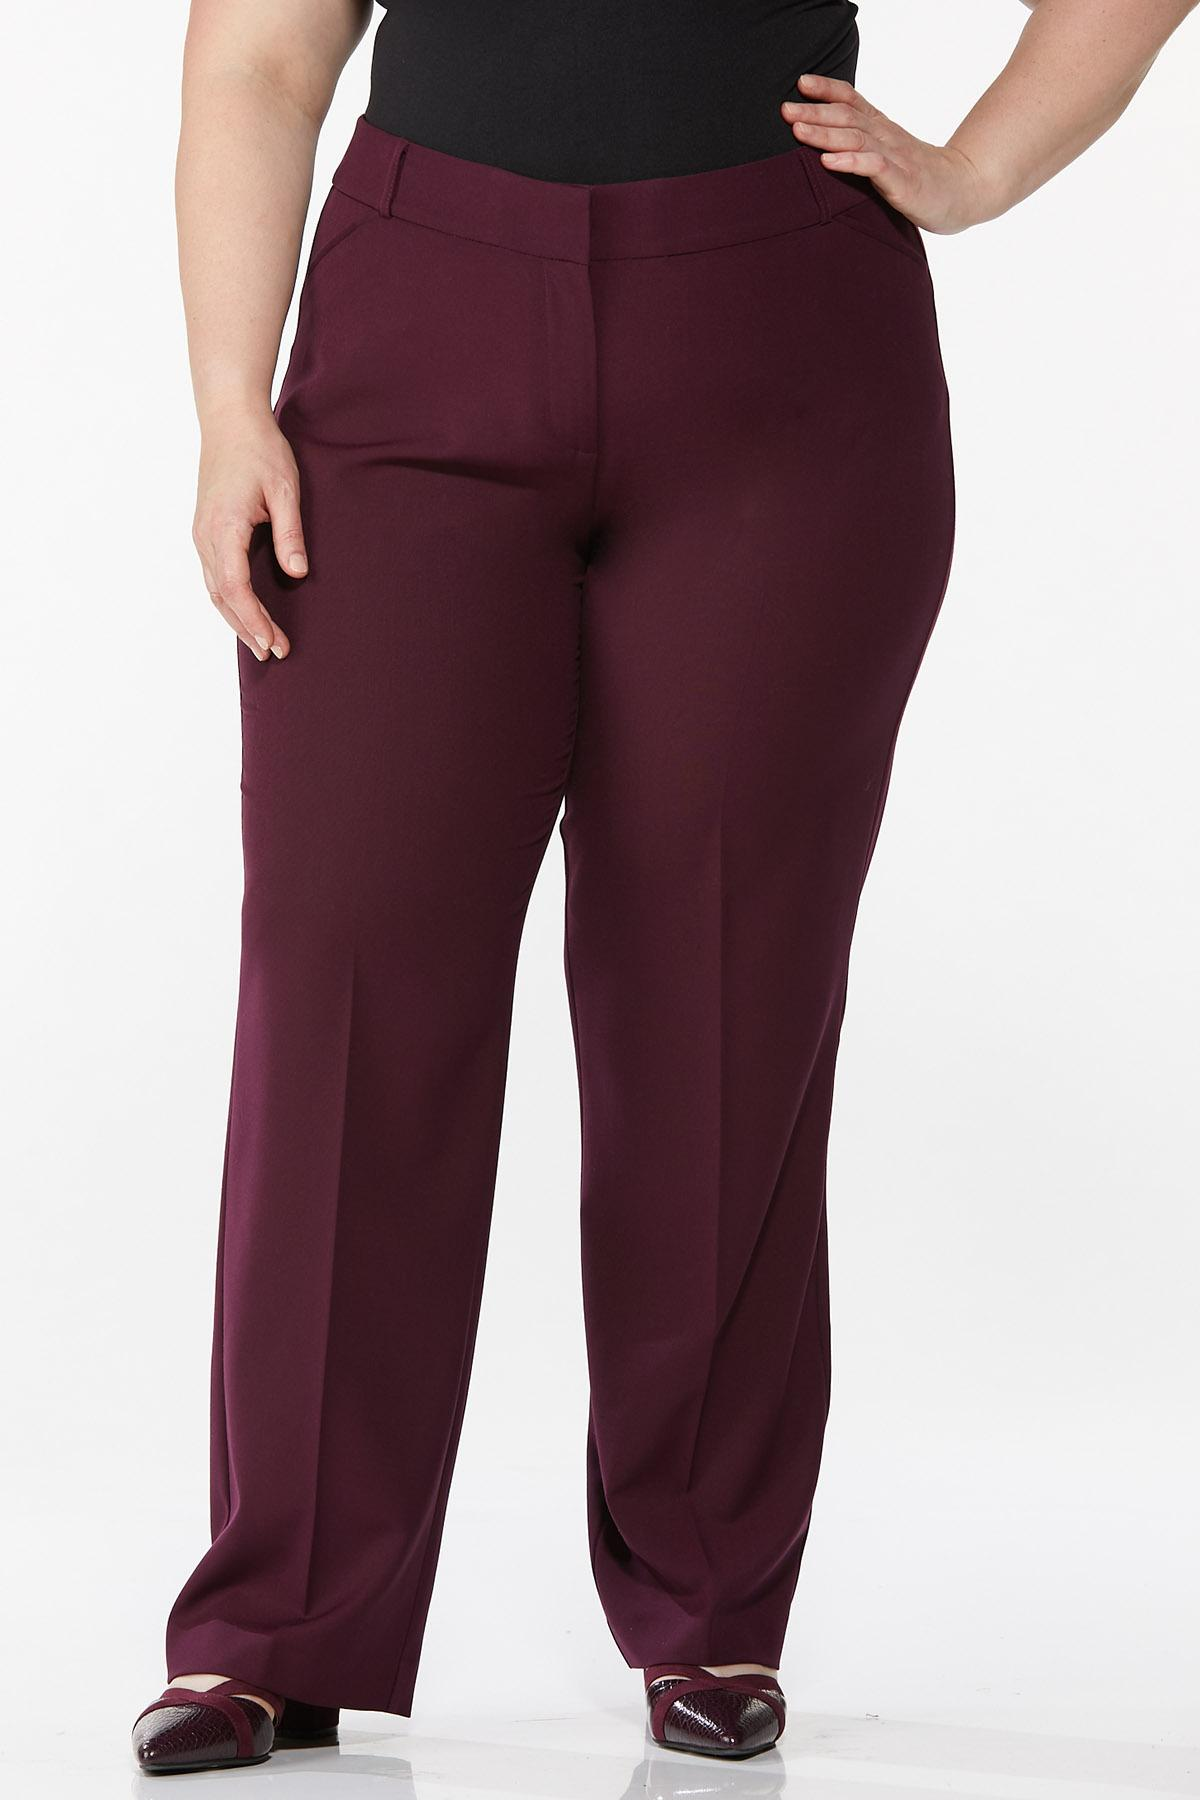 Plus Size Curvy Wine Trousers